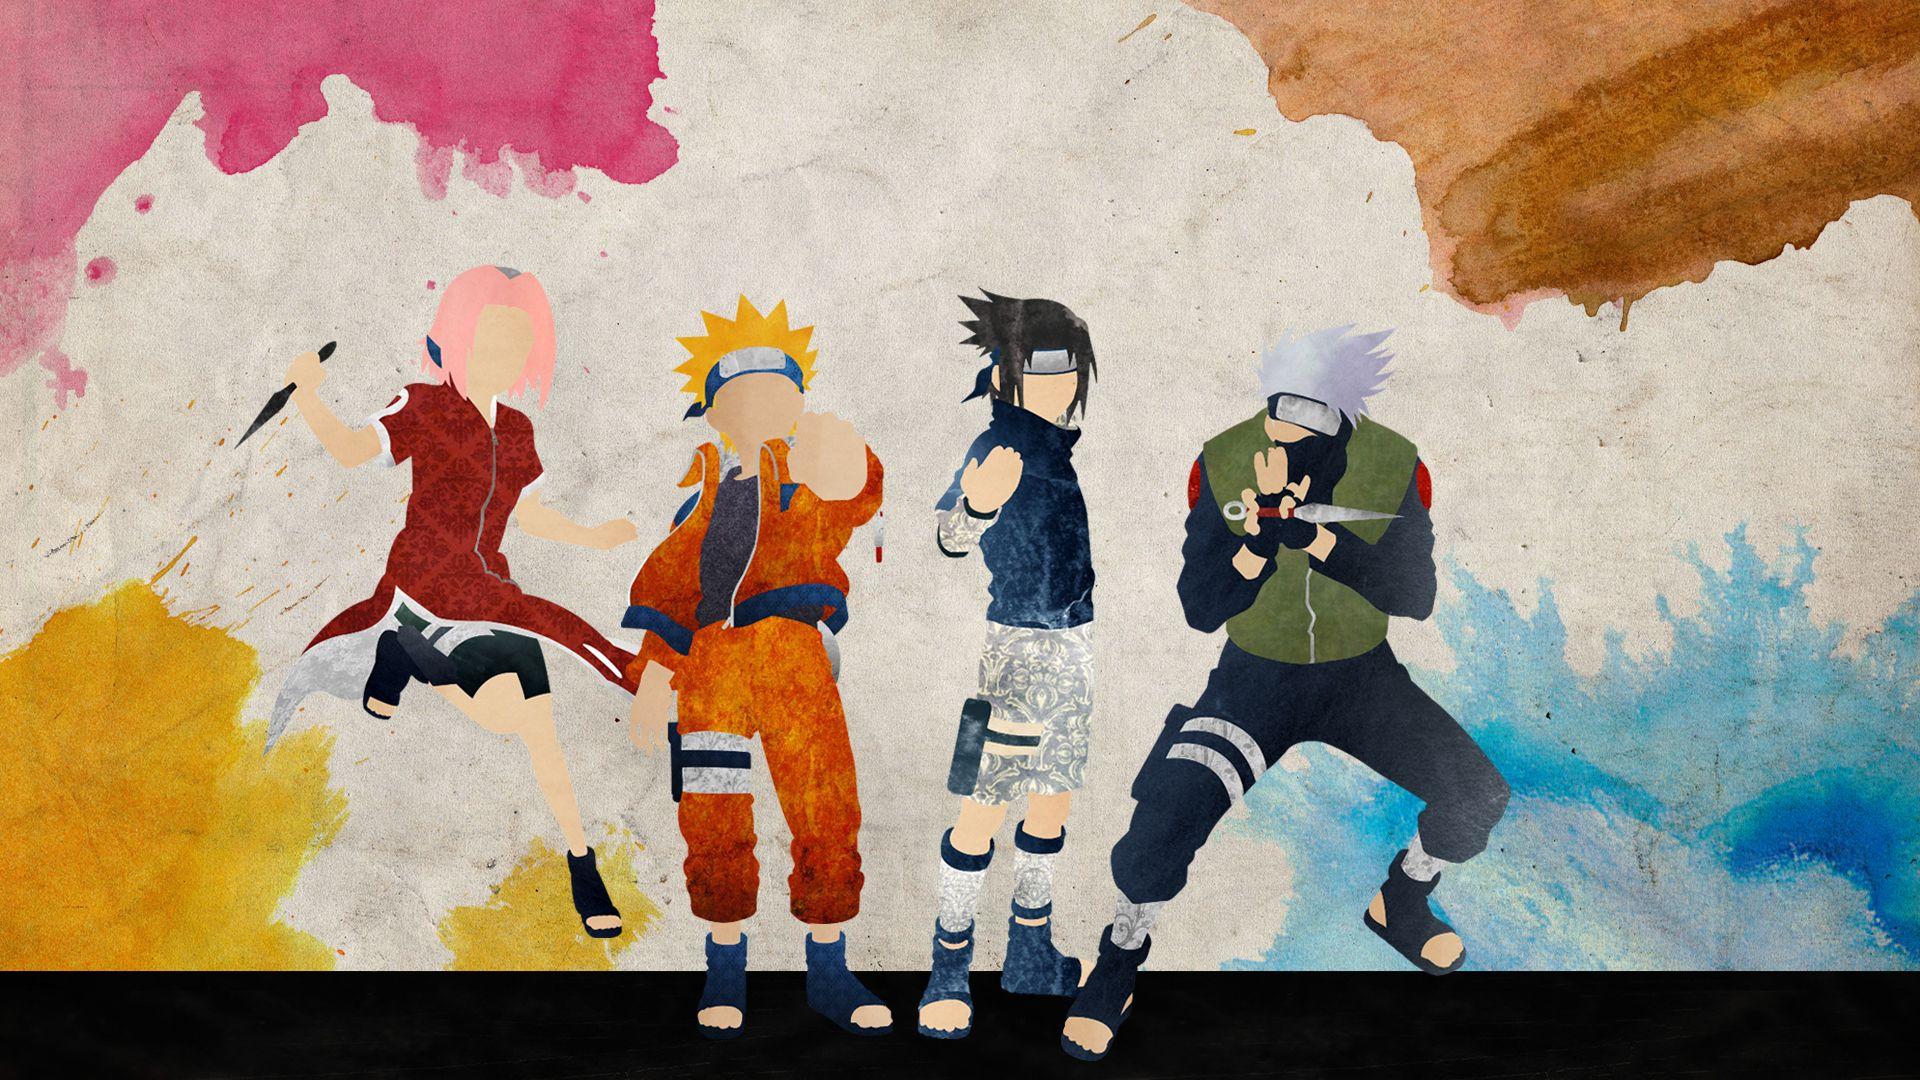 Team 7 Naruto By Doubleu42 On Deviantart Anime Naruto Team 7 Naruto